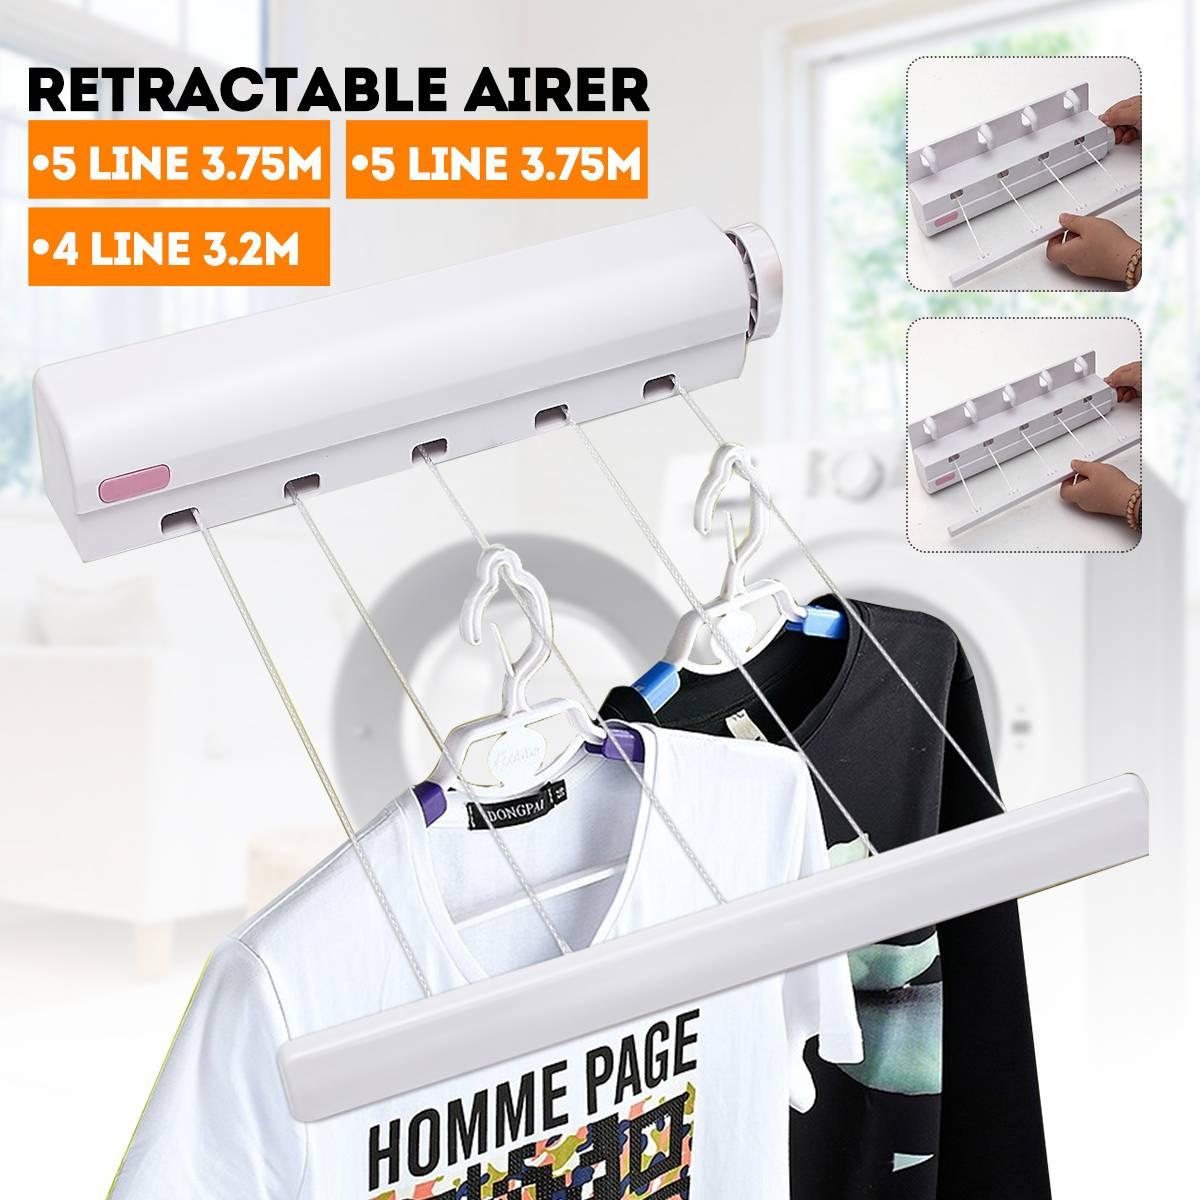 Retractable Indoor Clothes Hanger Hook Rope Wall Mounted Hanger Drying Towel Rack Flexible Clothesline Bathroom Clothes Dryer